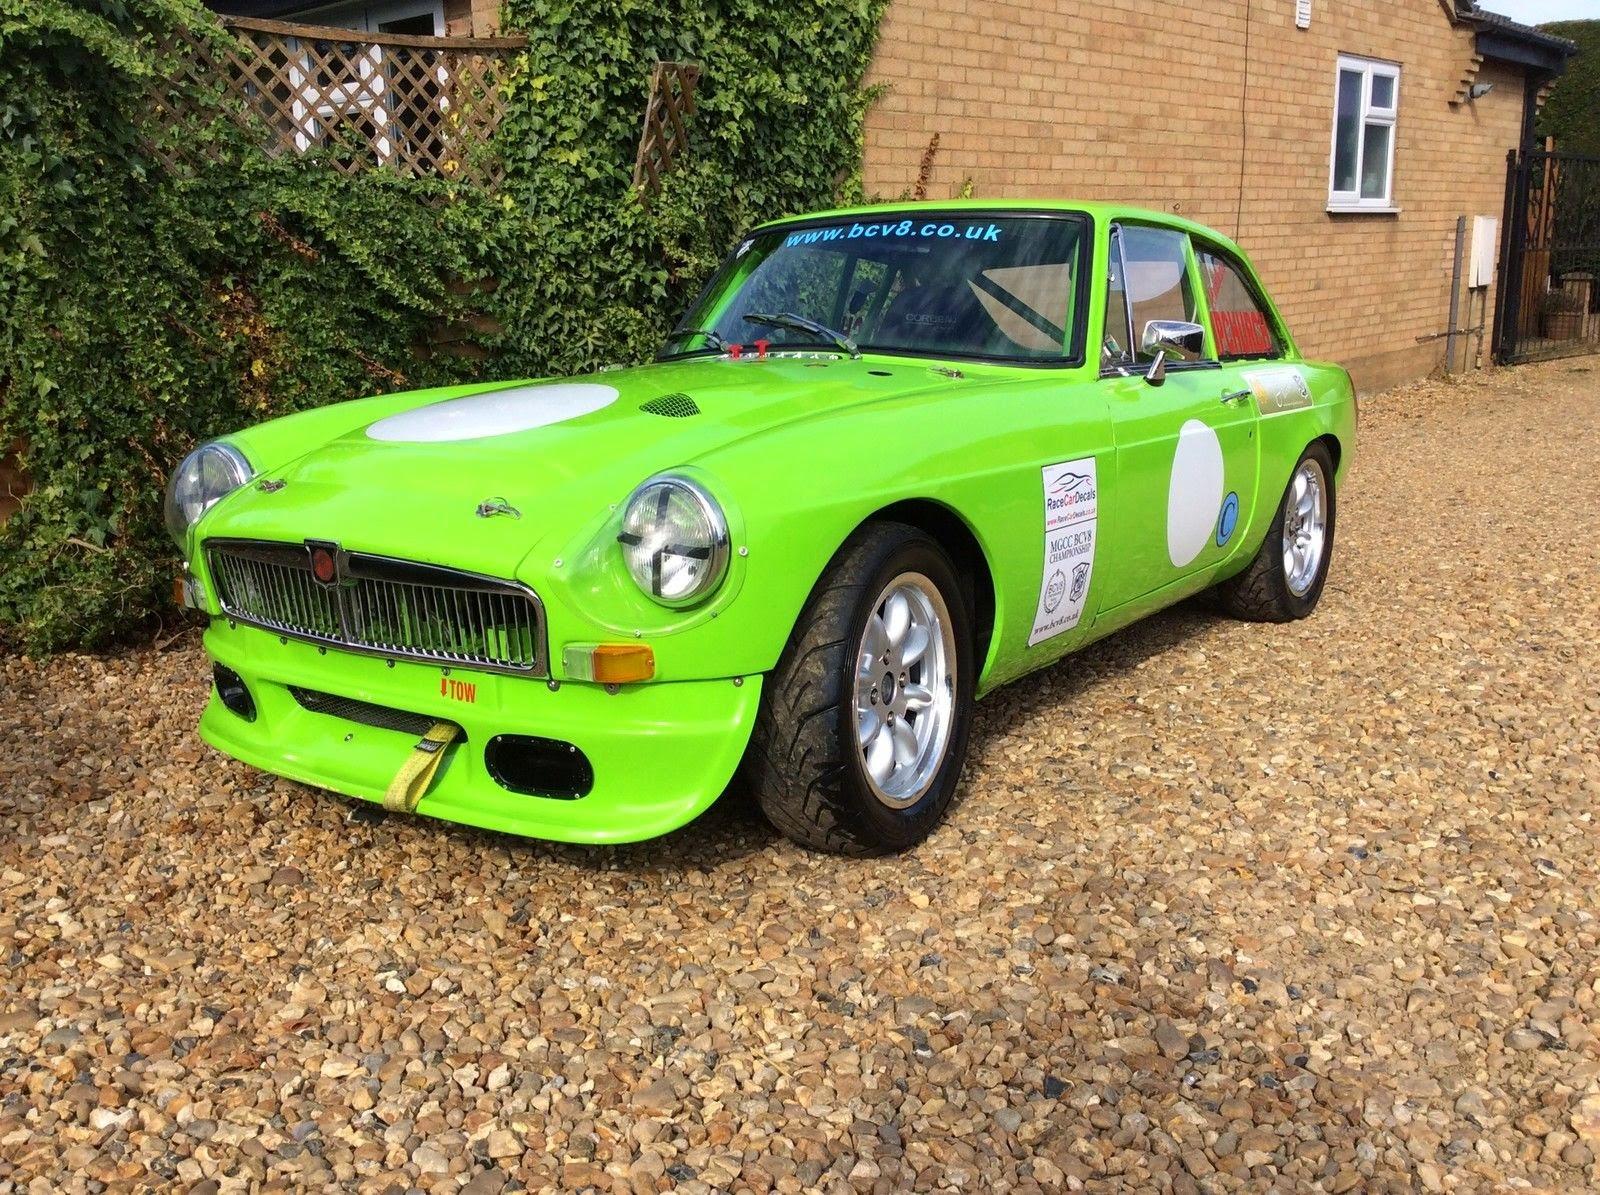 1975 MG MGB GT V8 Race Car | Auto Restorationice